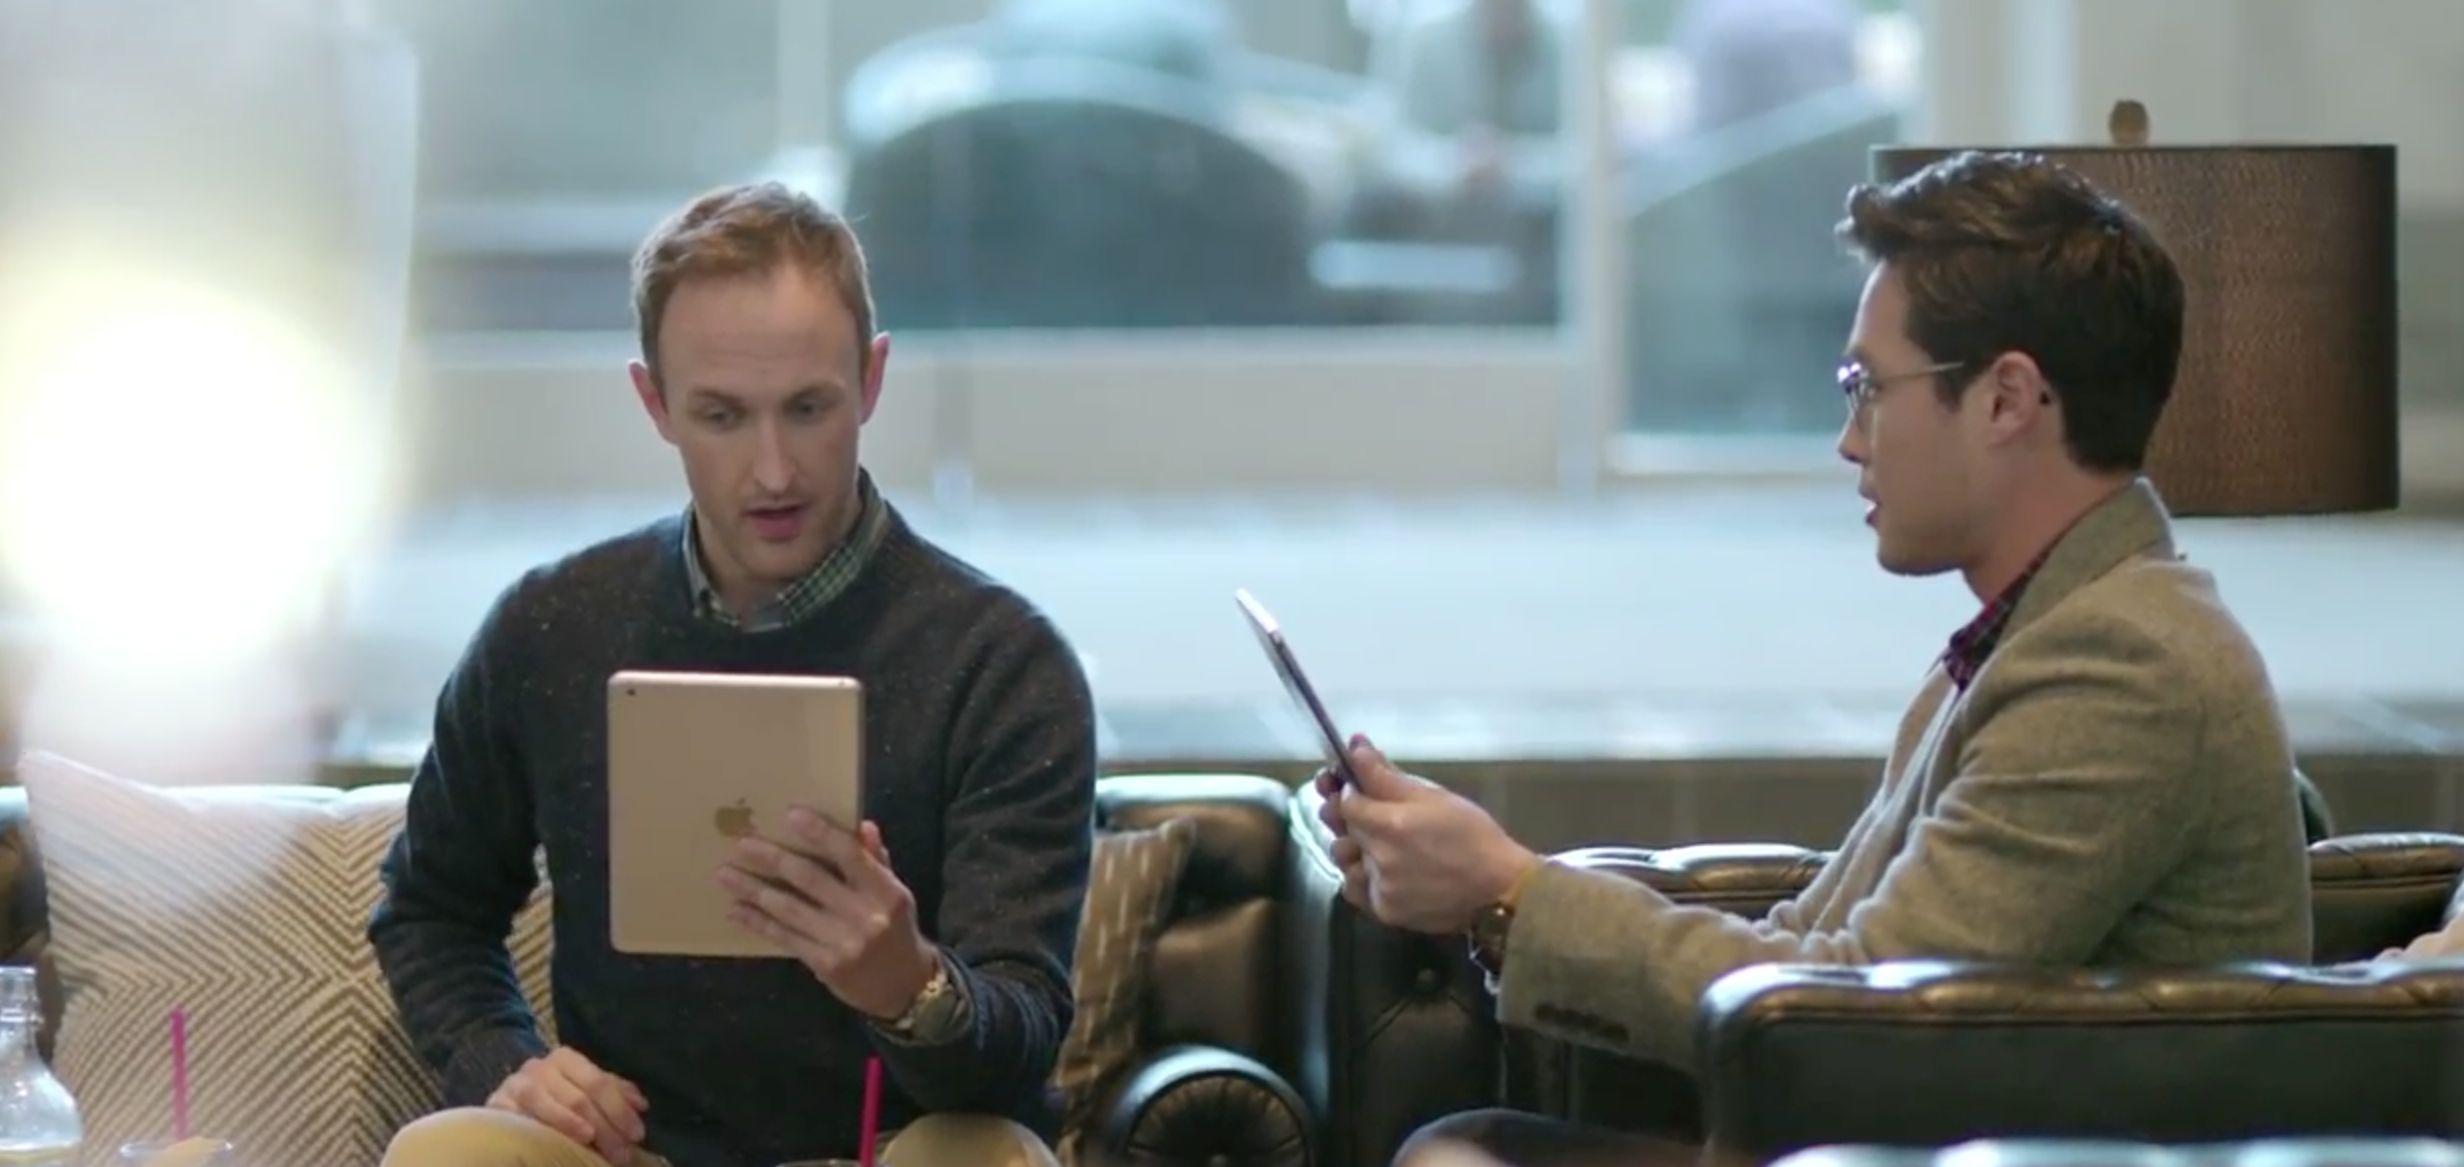 Samsung ad (multitasking Galaxy Tab Pro 001)